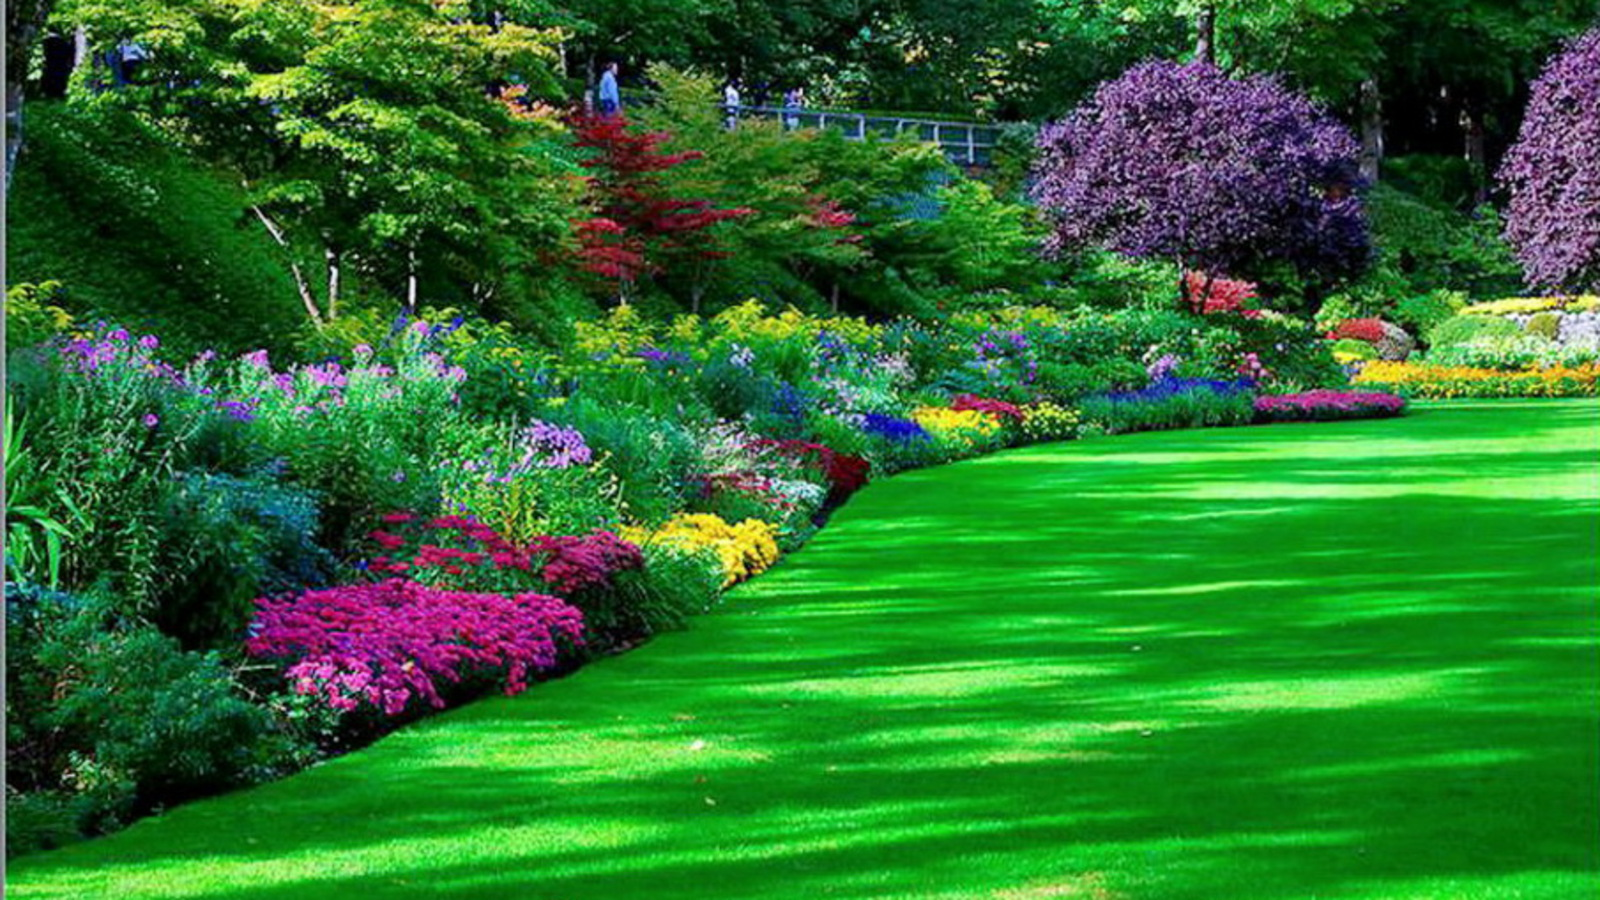 English garden desktop wallpaper wallpapersafari - Nature background pictures for computer ...